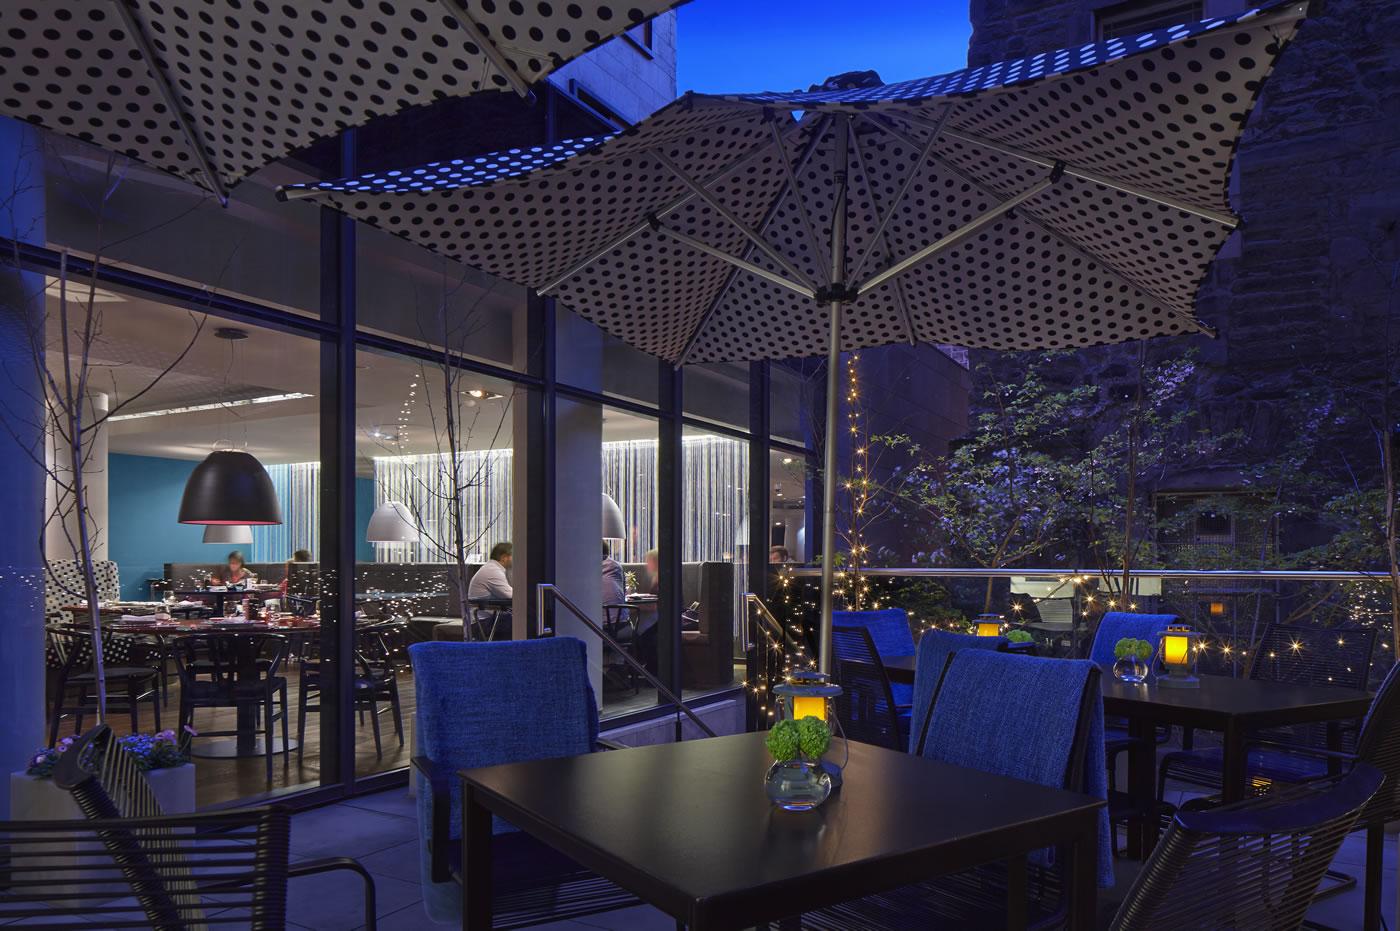 G v royal mile hotel edinburgh review for Cucina g v hotel